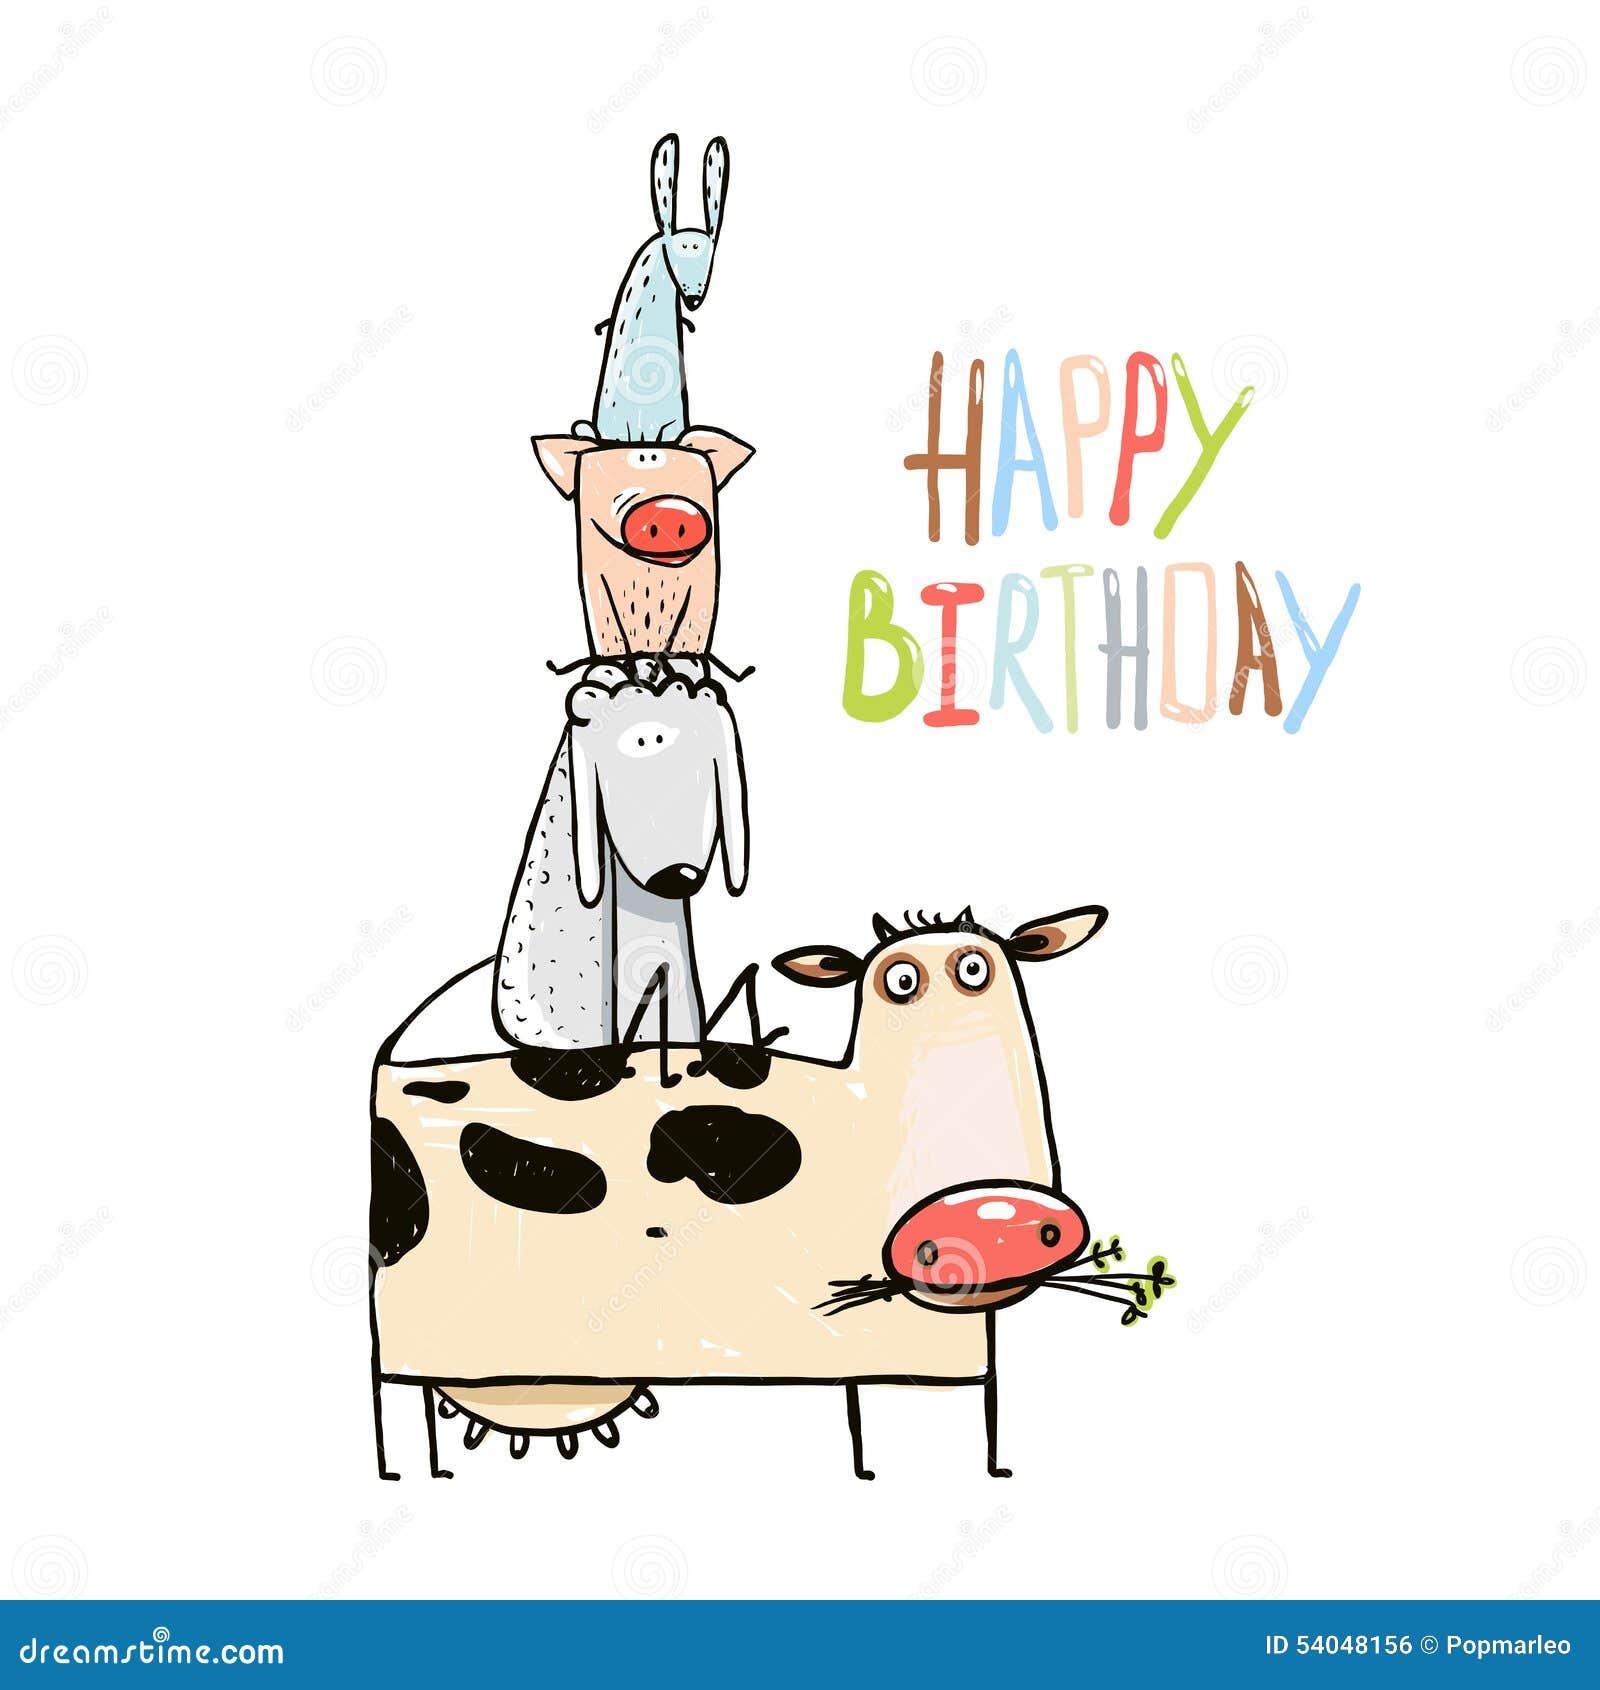 Birthday funny cartoon farm domestic animals stock vector birthday funny cartoon farm domestic animals kristyandbryce Image collections